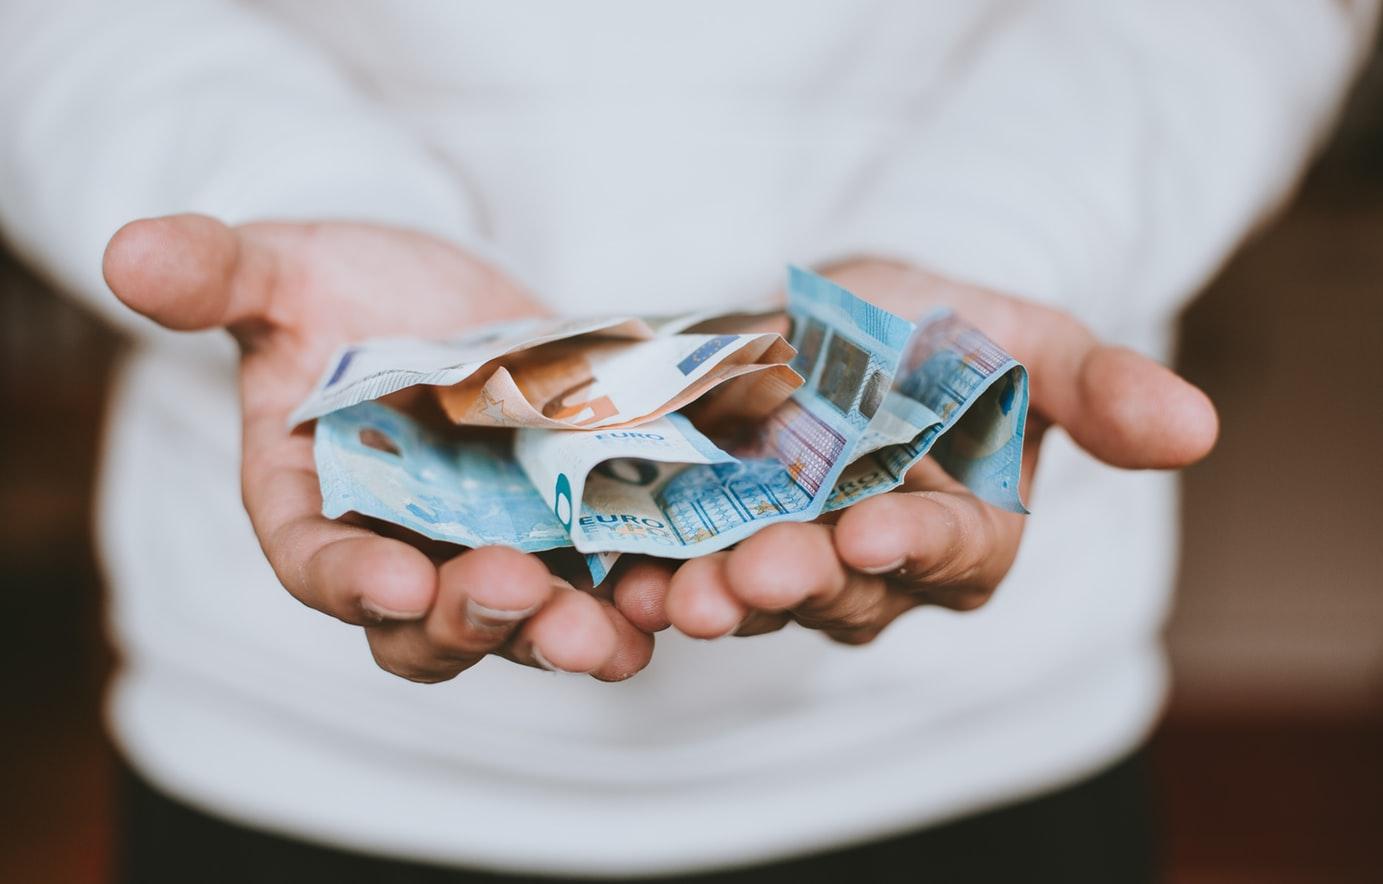 Retoma do Contrato de Crédito